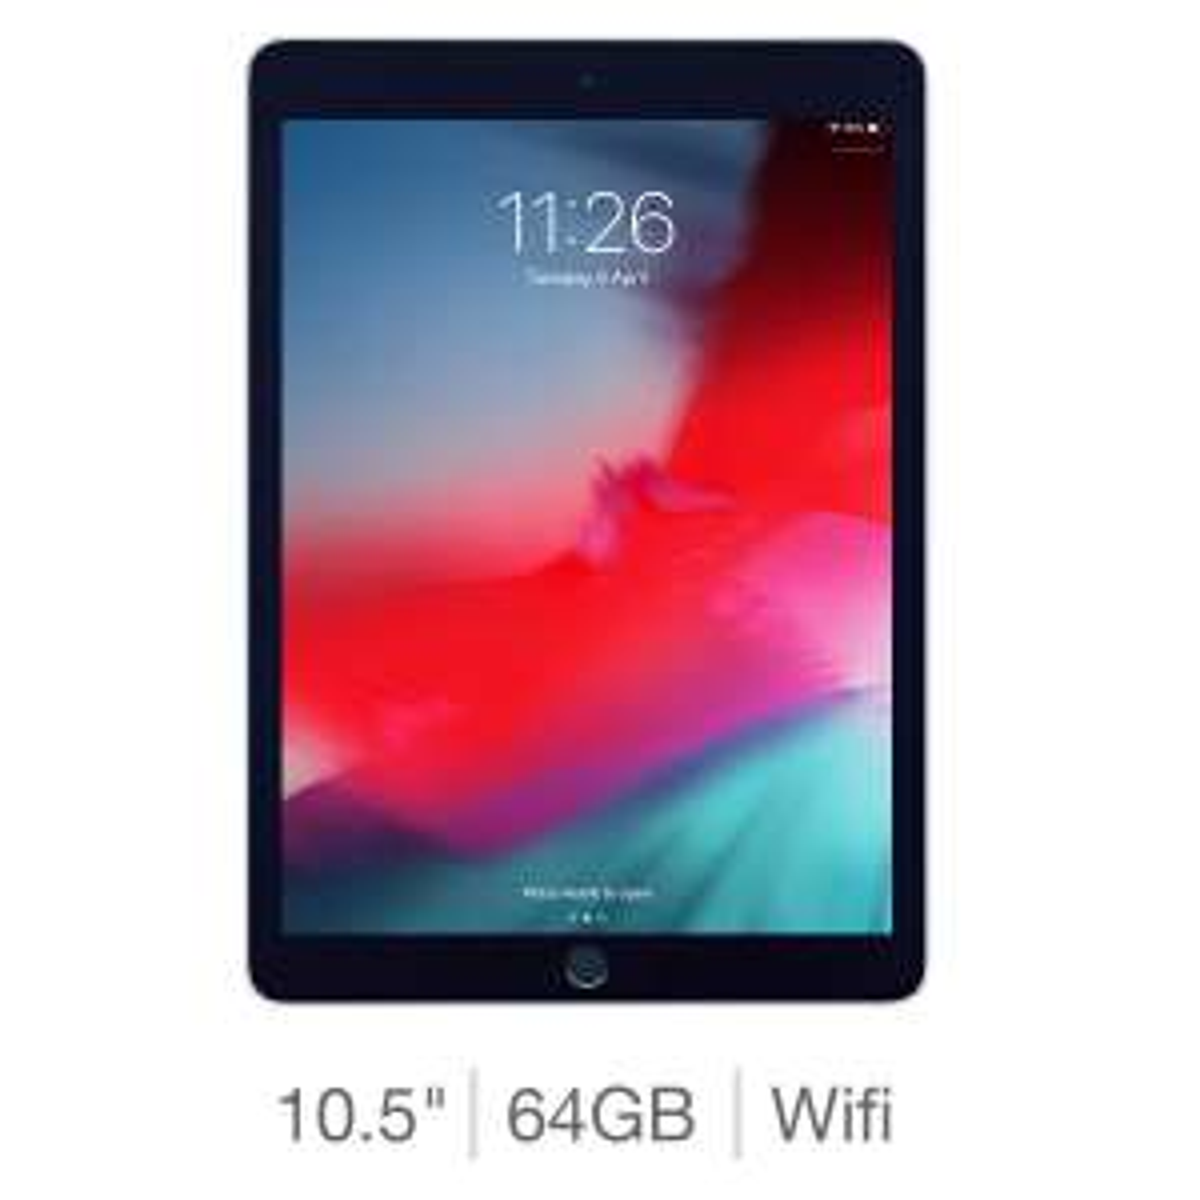 Apple iPad Air 2019, 10.5 Inch, 64GB Wifi £434.99 @ Costco